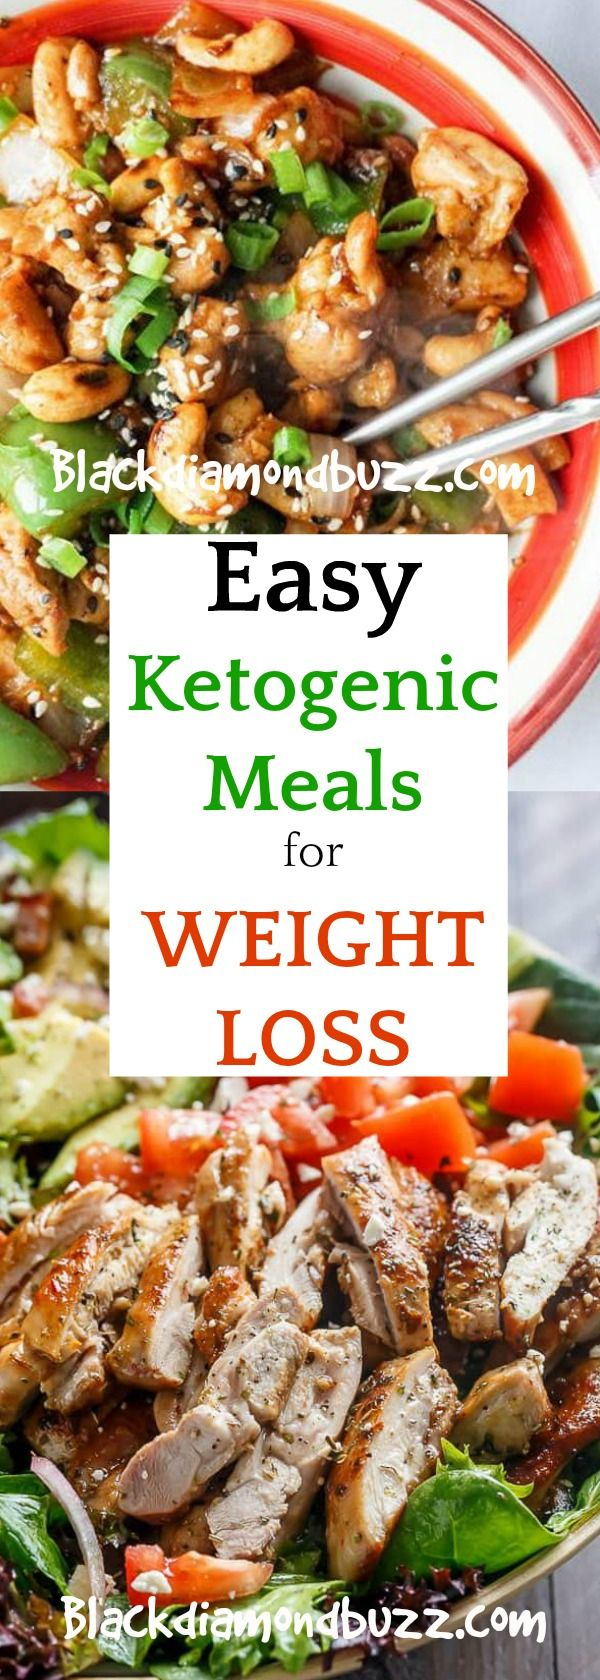 lose 4 kg of fat